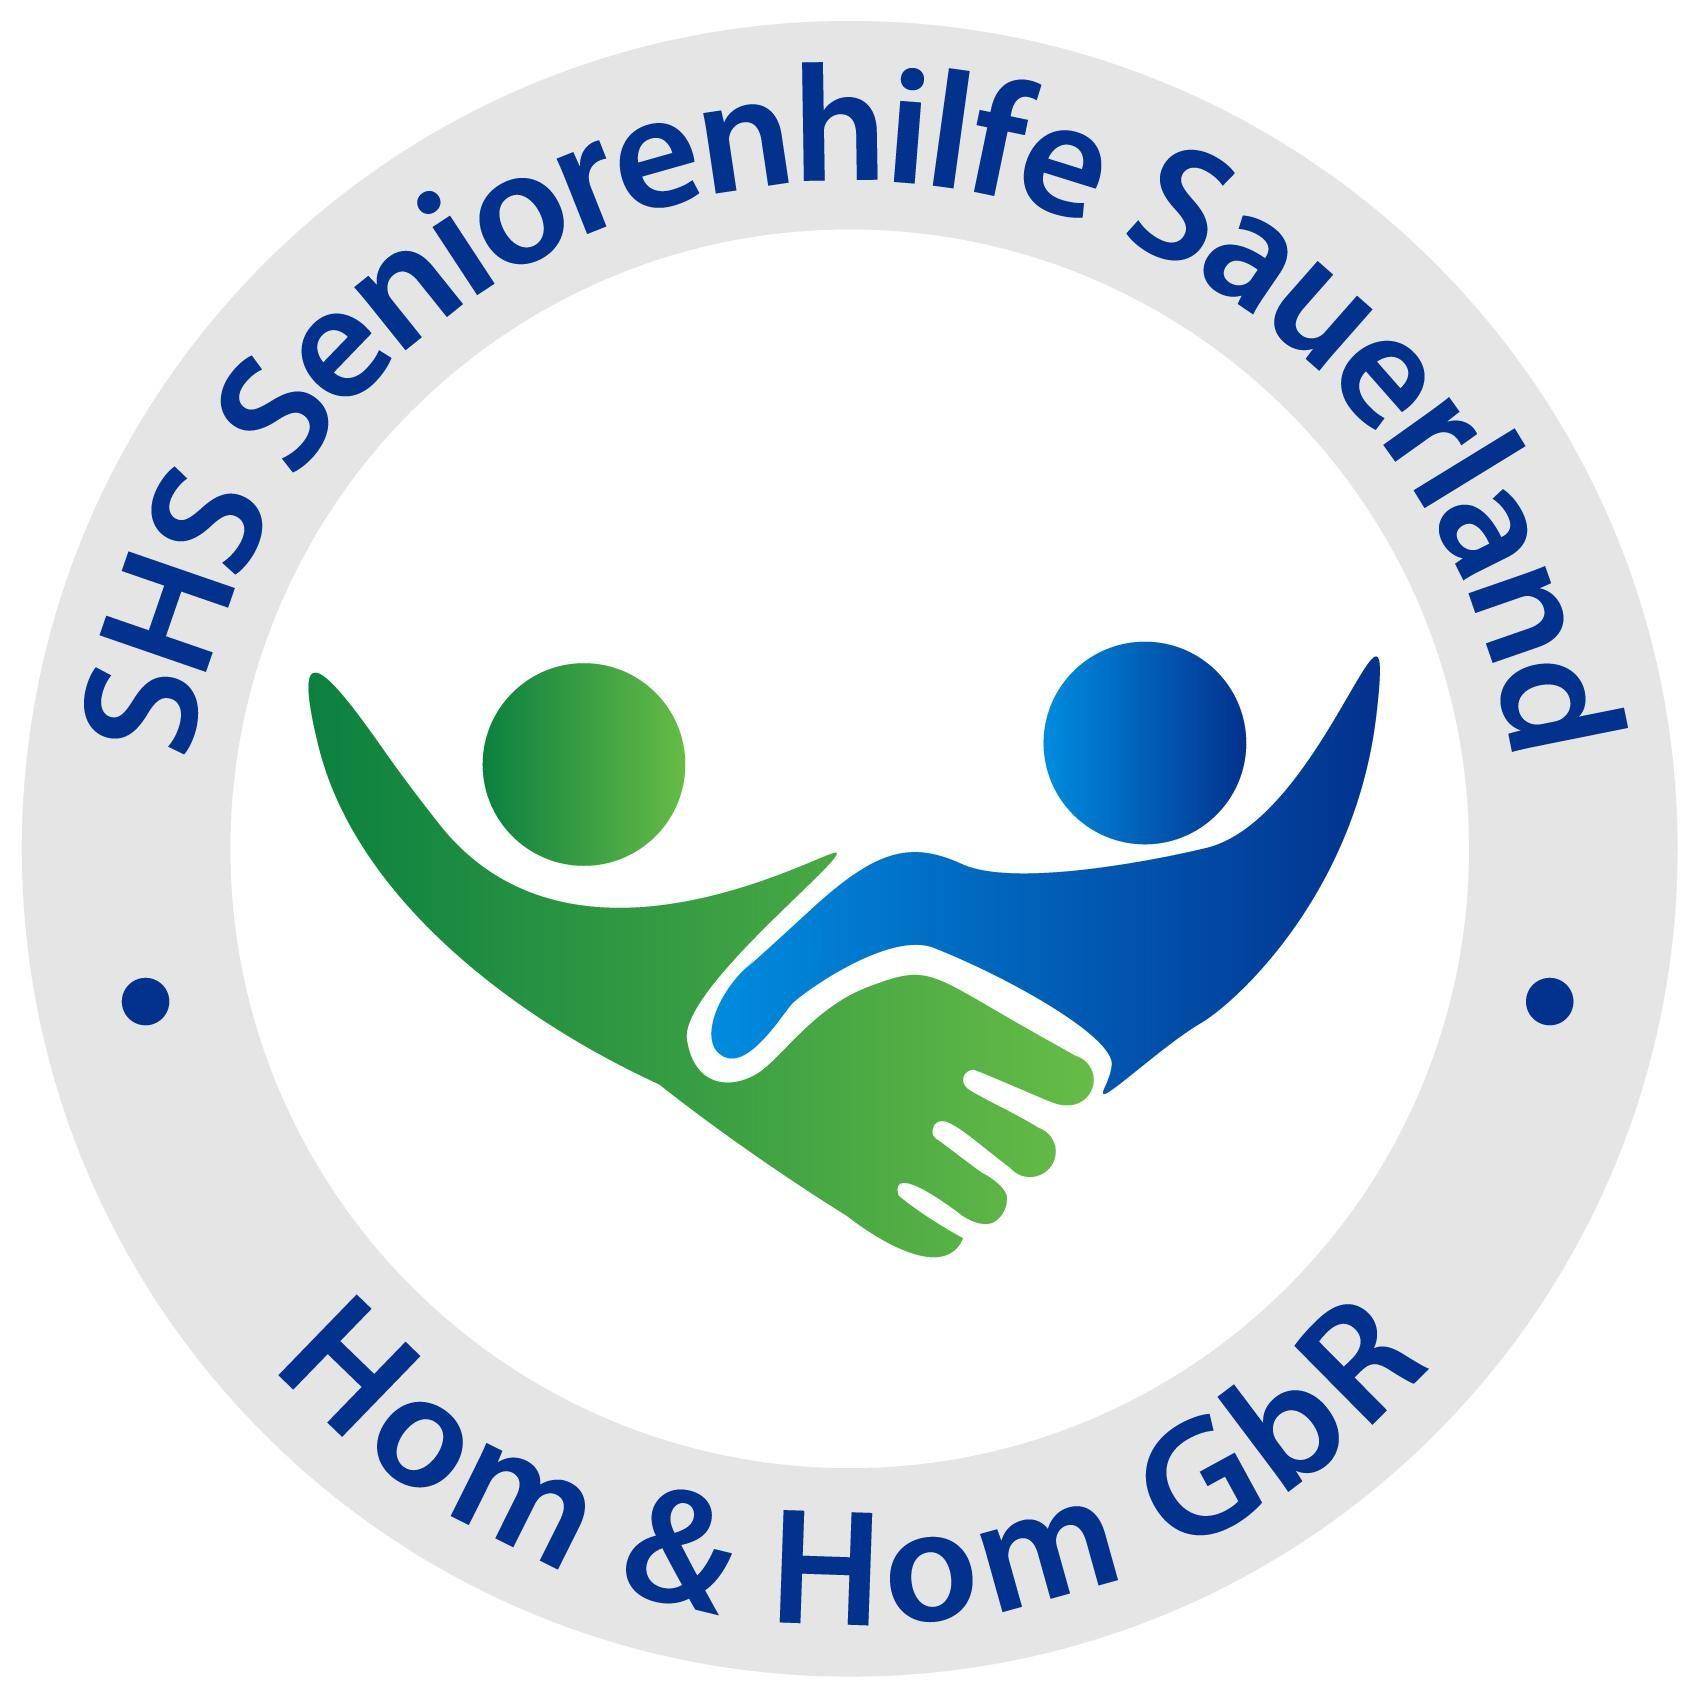 Seniorenhilfe Sauerland